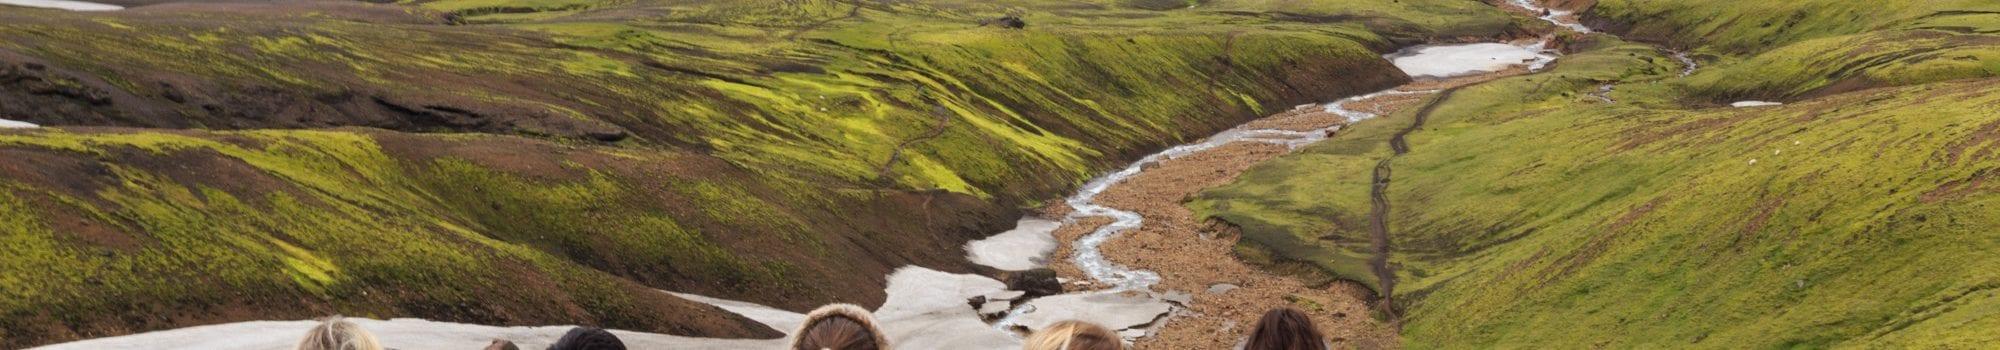 Thorsmork with arctic adventures in iceland people enjoyin the view in Landmannalaugar